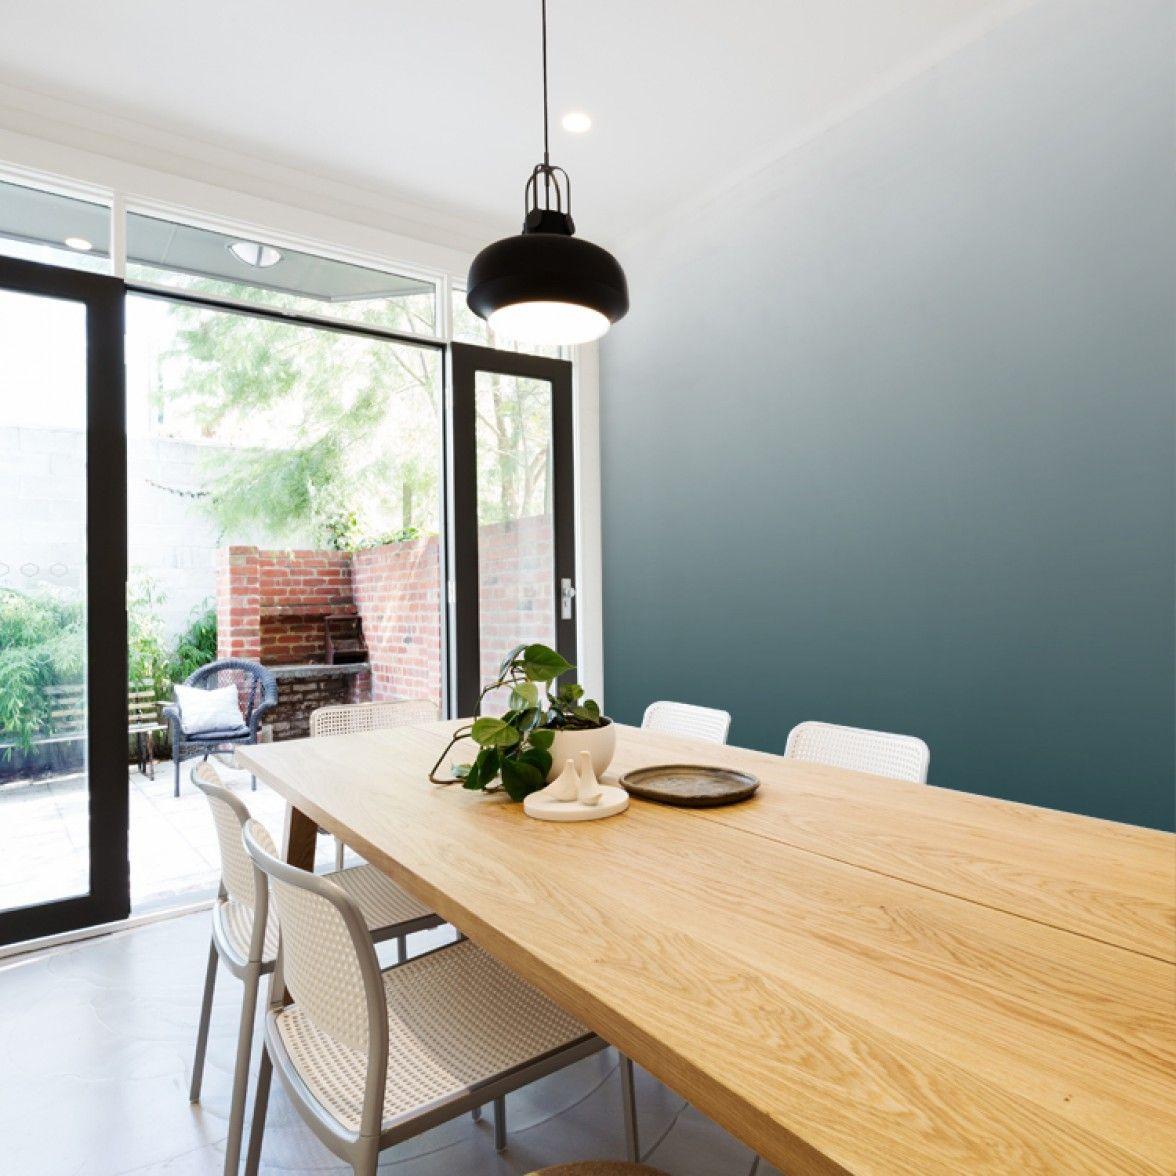 TwoTone Wallpaper Modern Wallpaper Designs 2 Color